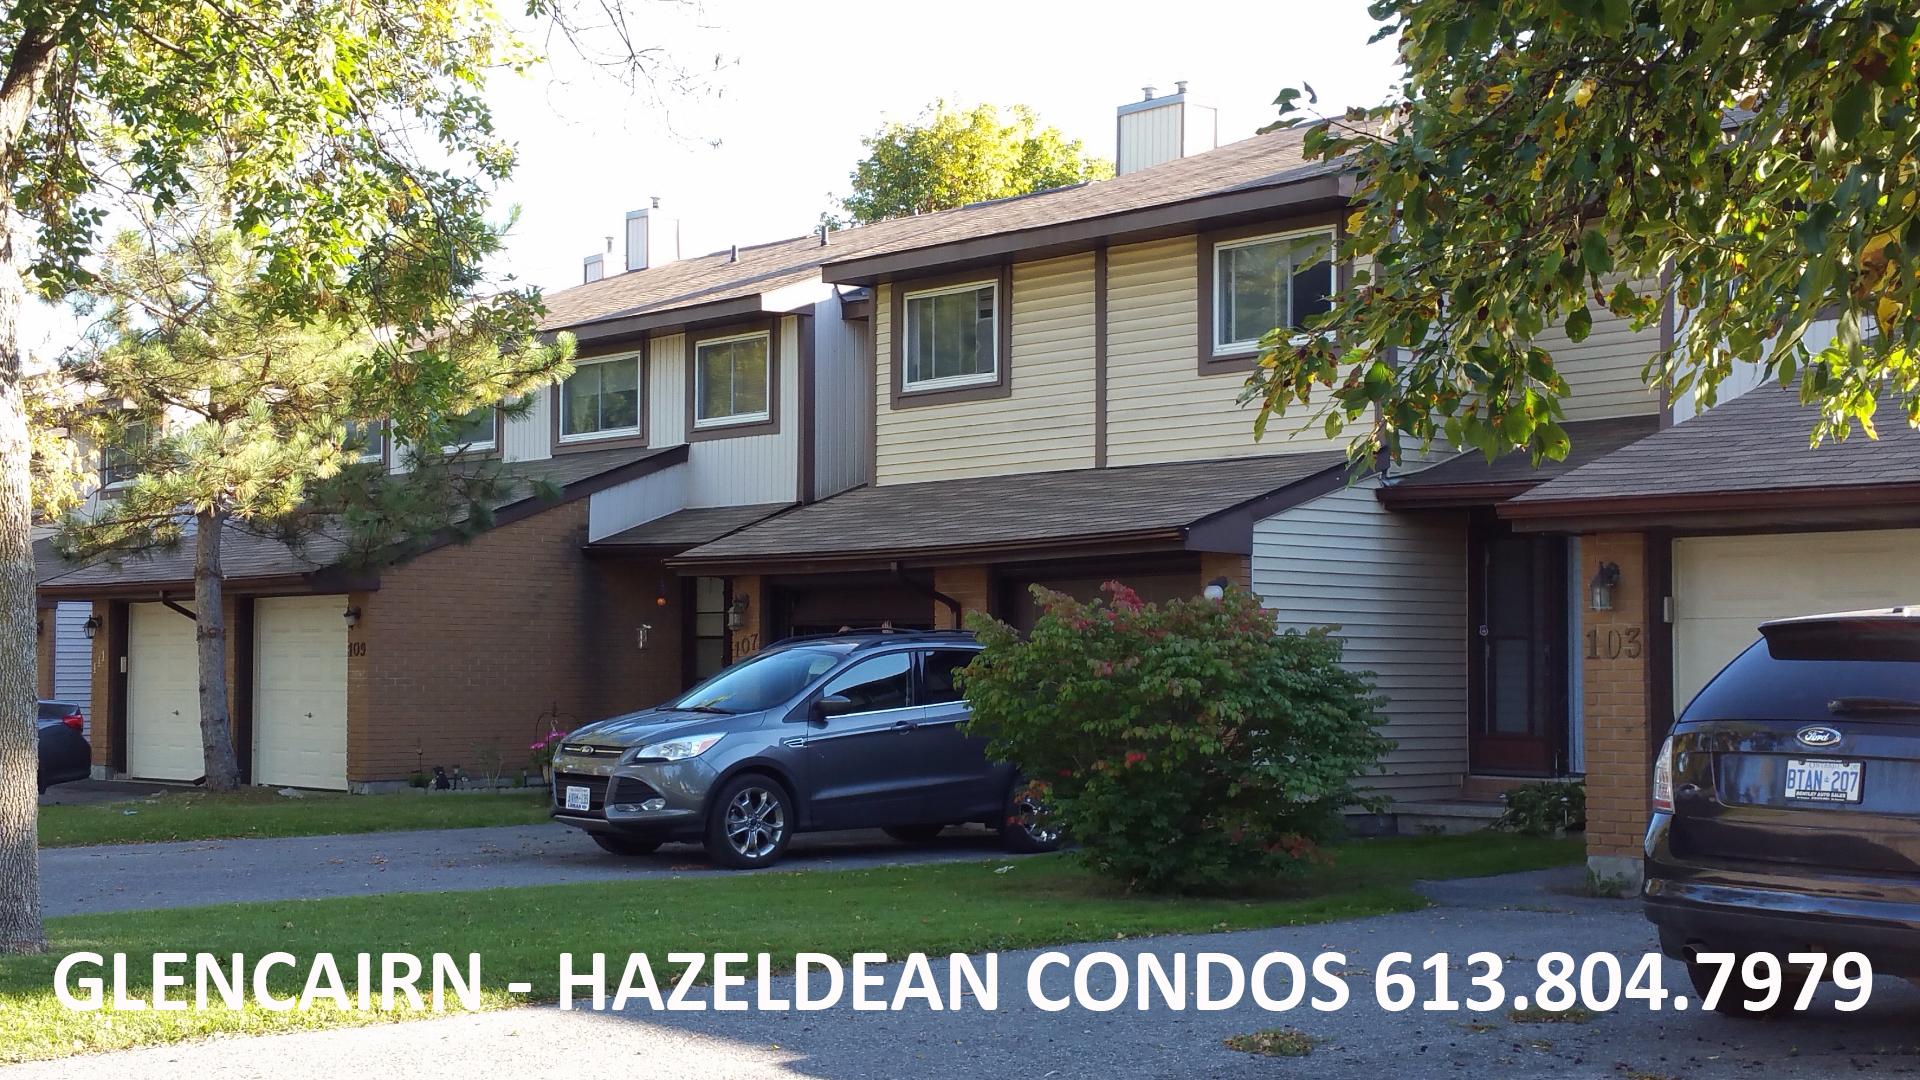 Ottawa condos for sale glencairnhazeldean 93 141 castlefrank road solutioingenieria Gallery